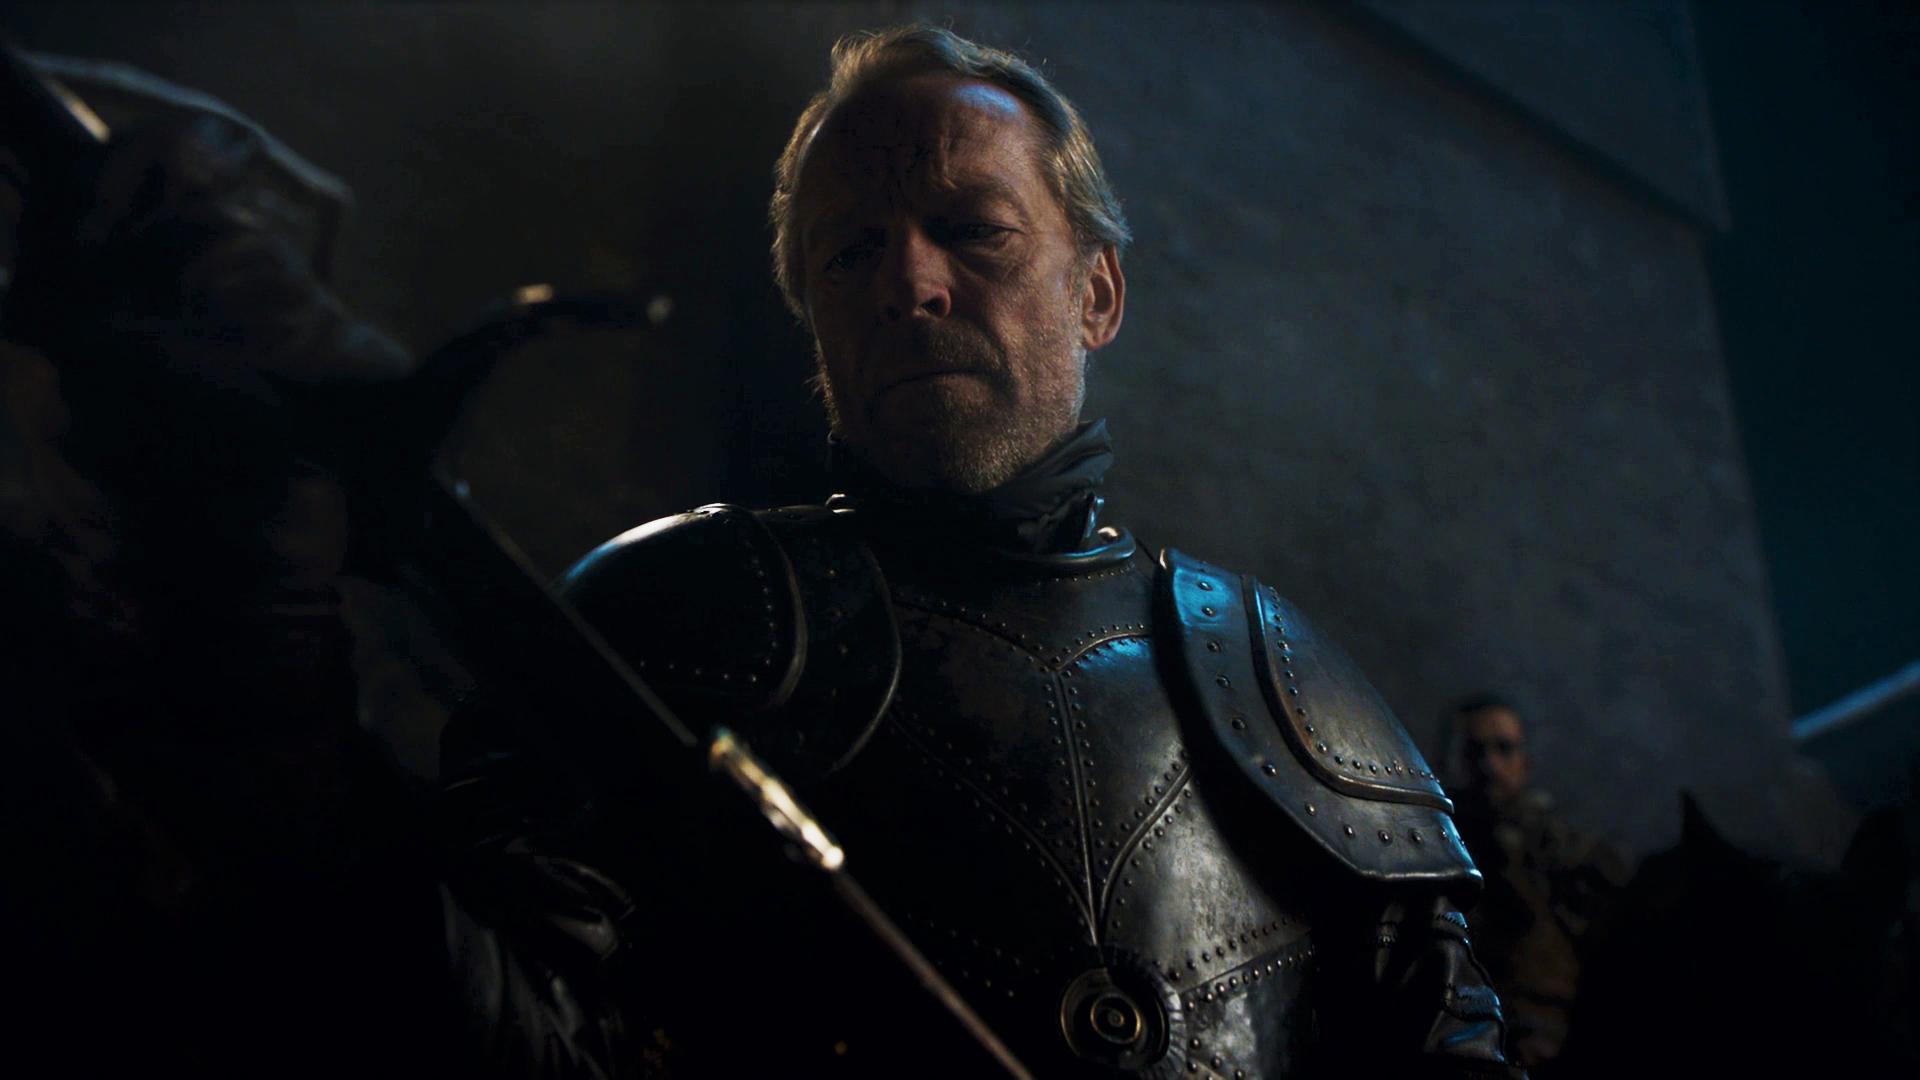 Jorah Mormont Heartsbane Valyrian Steel Sword Season 8 802